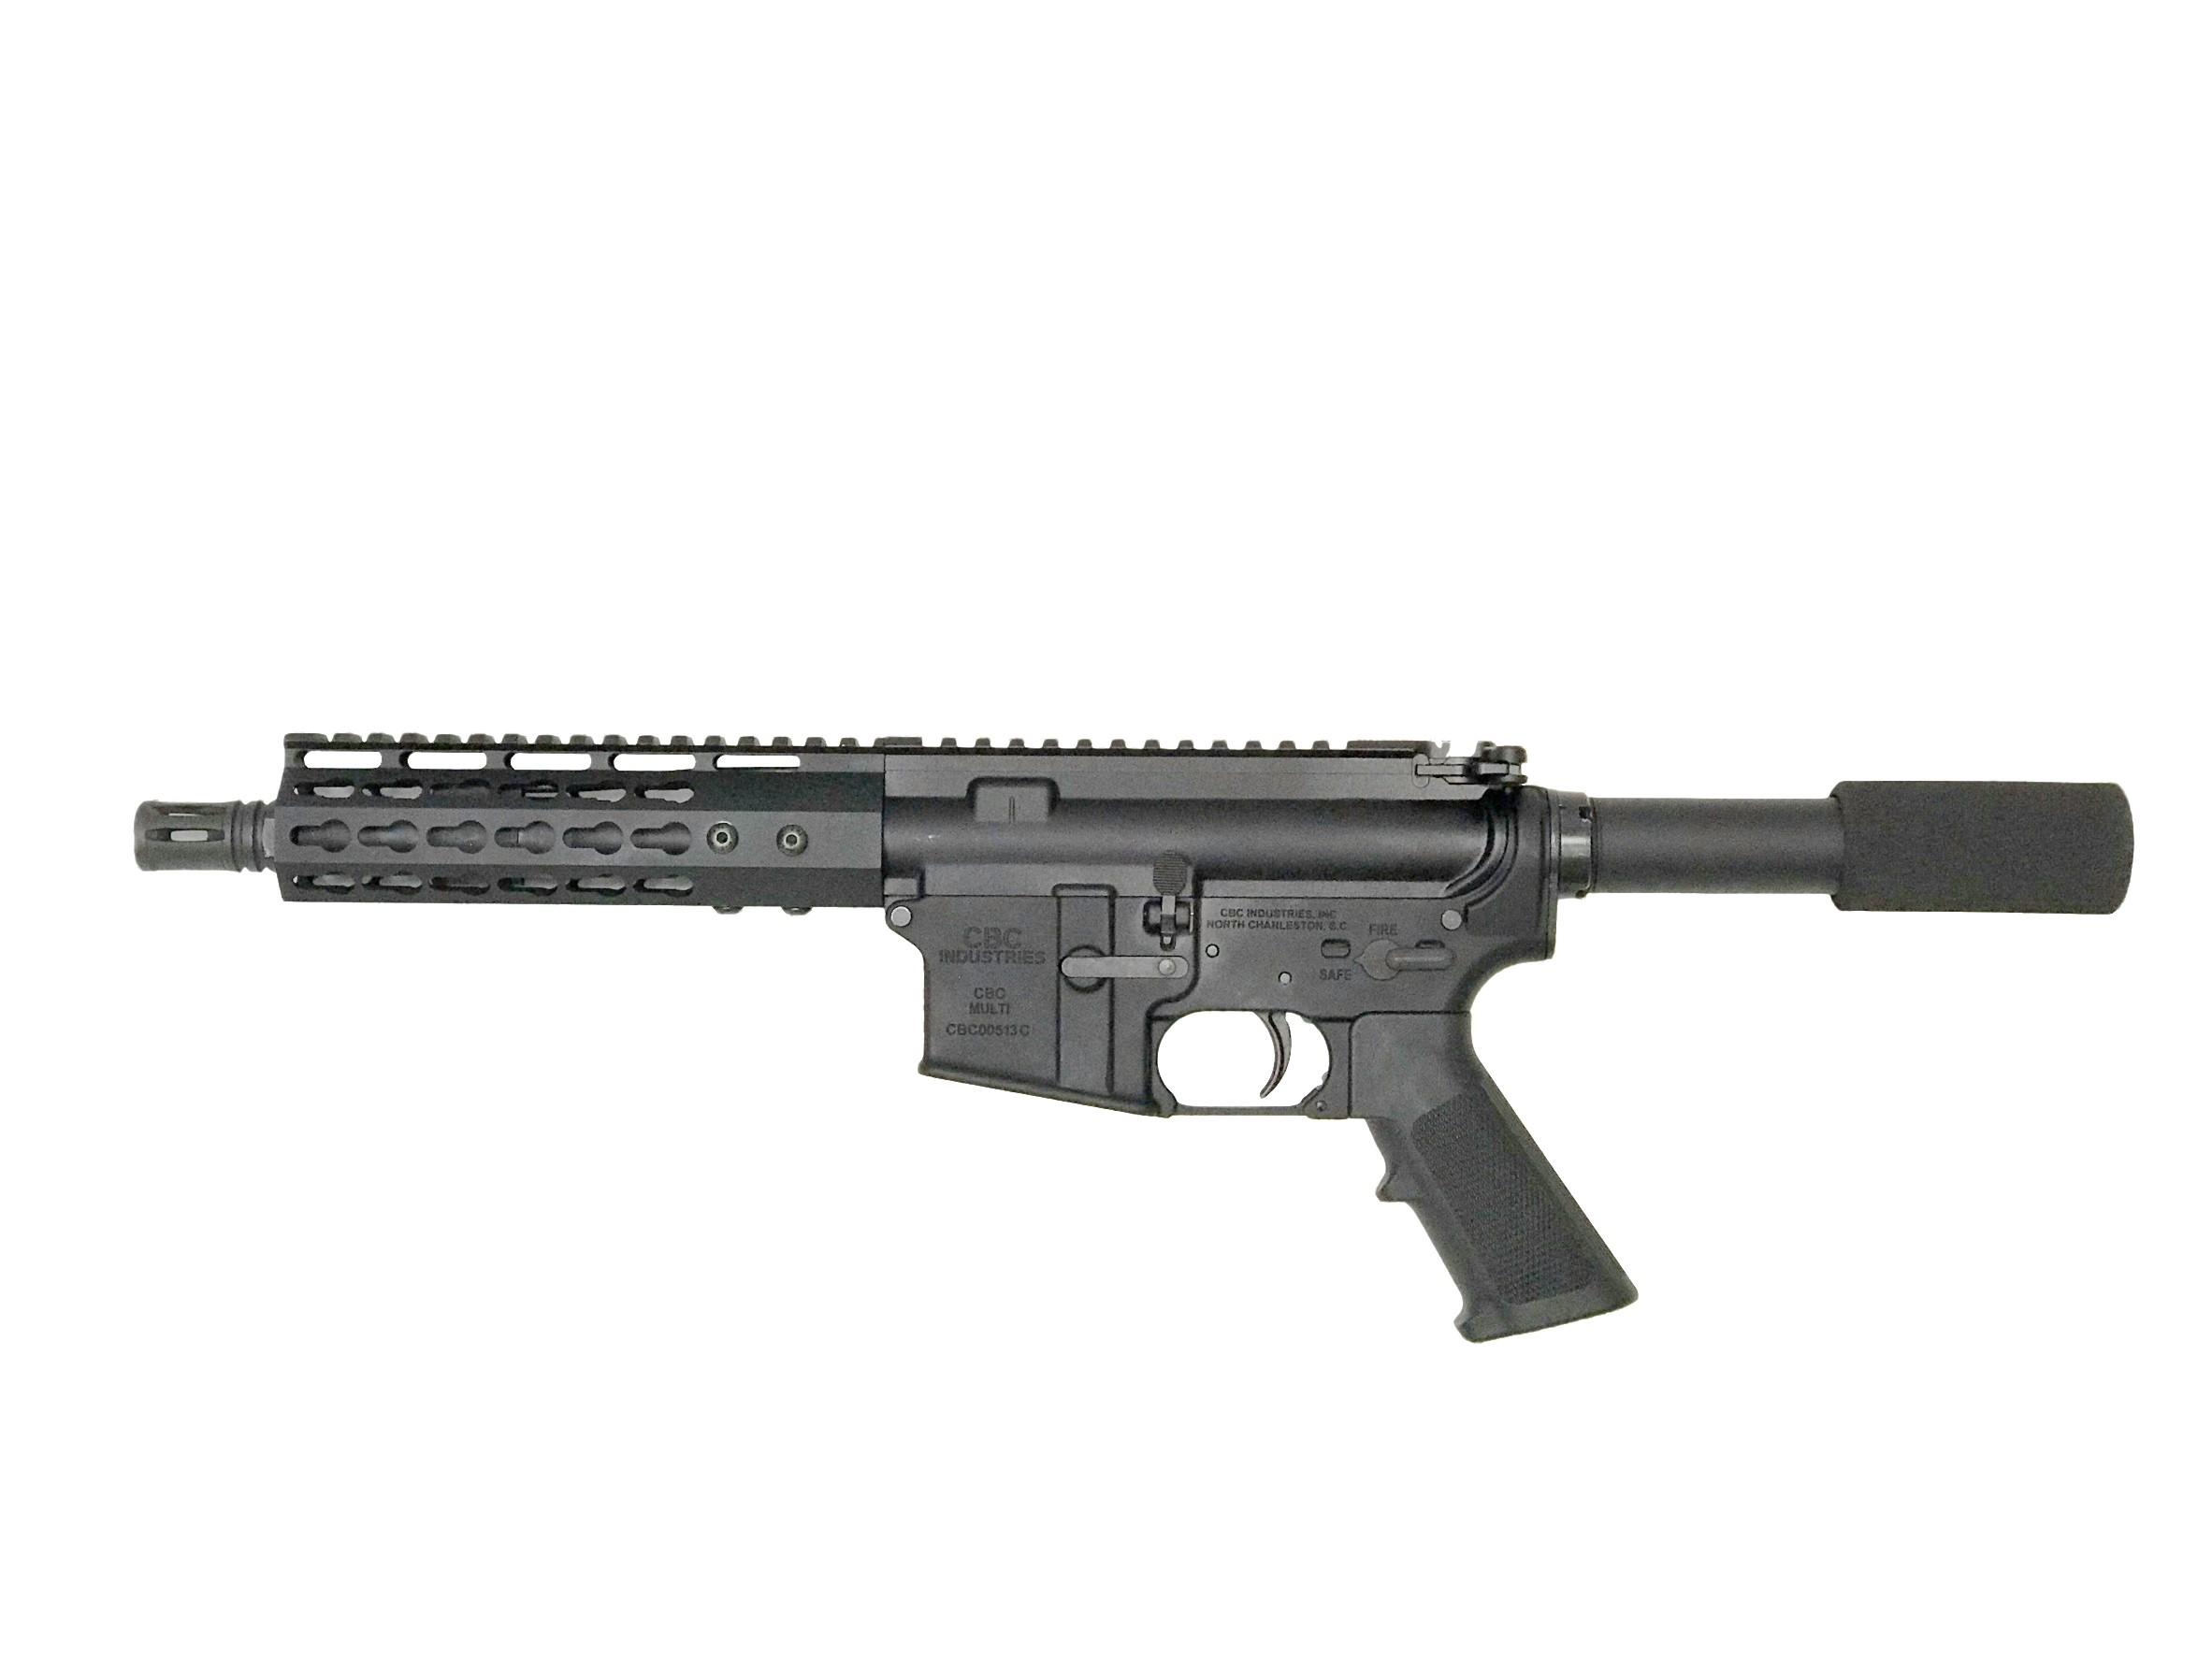 cbc ar 15 pistol